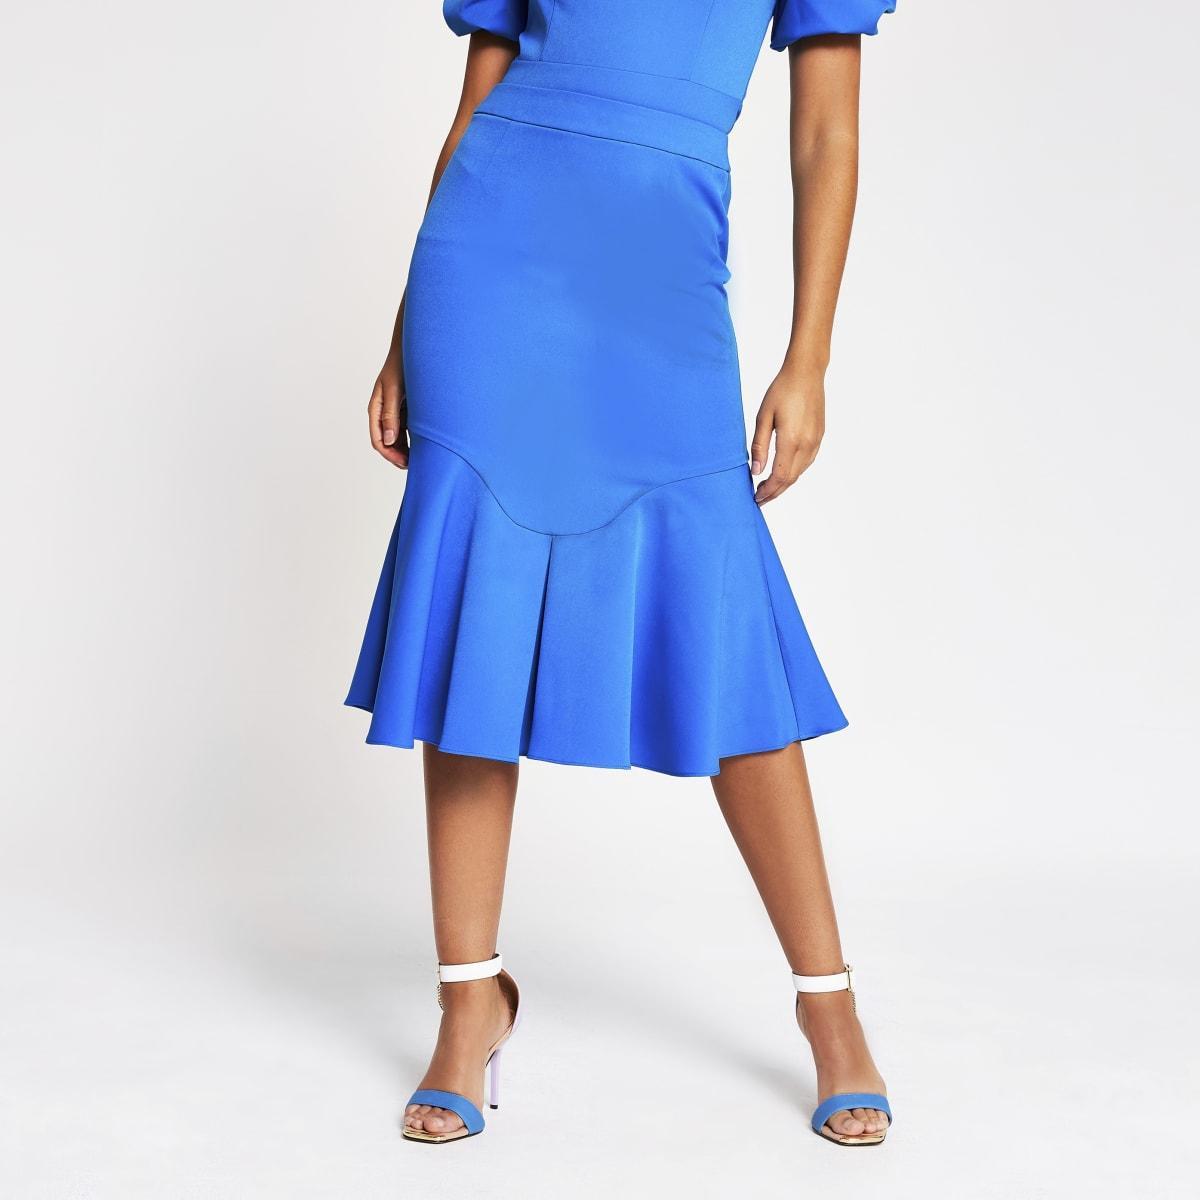 Blue fitted peplum frill midi skirt